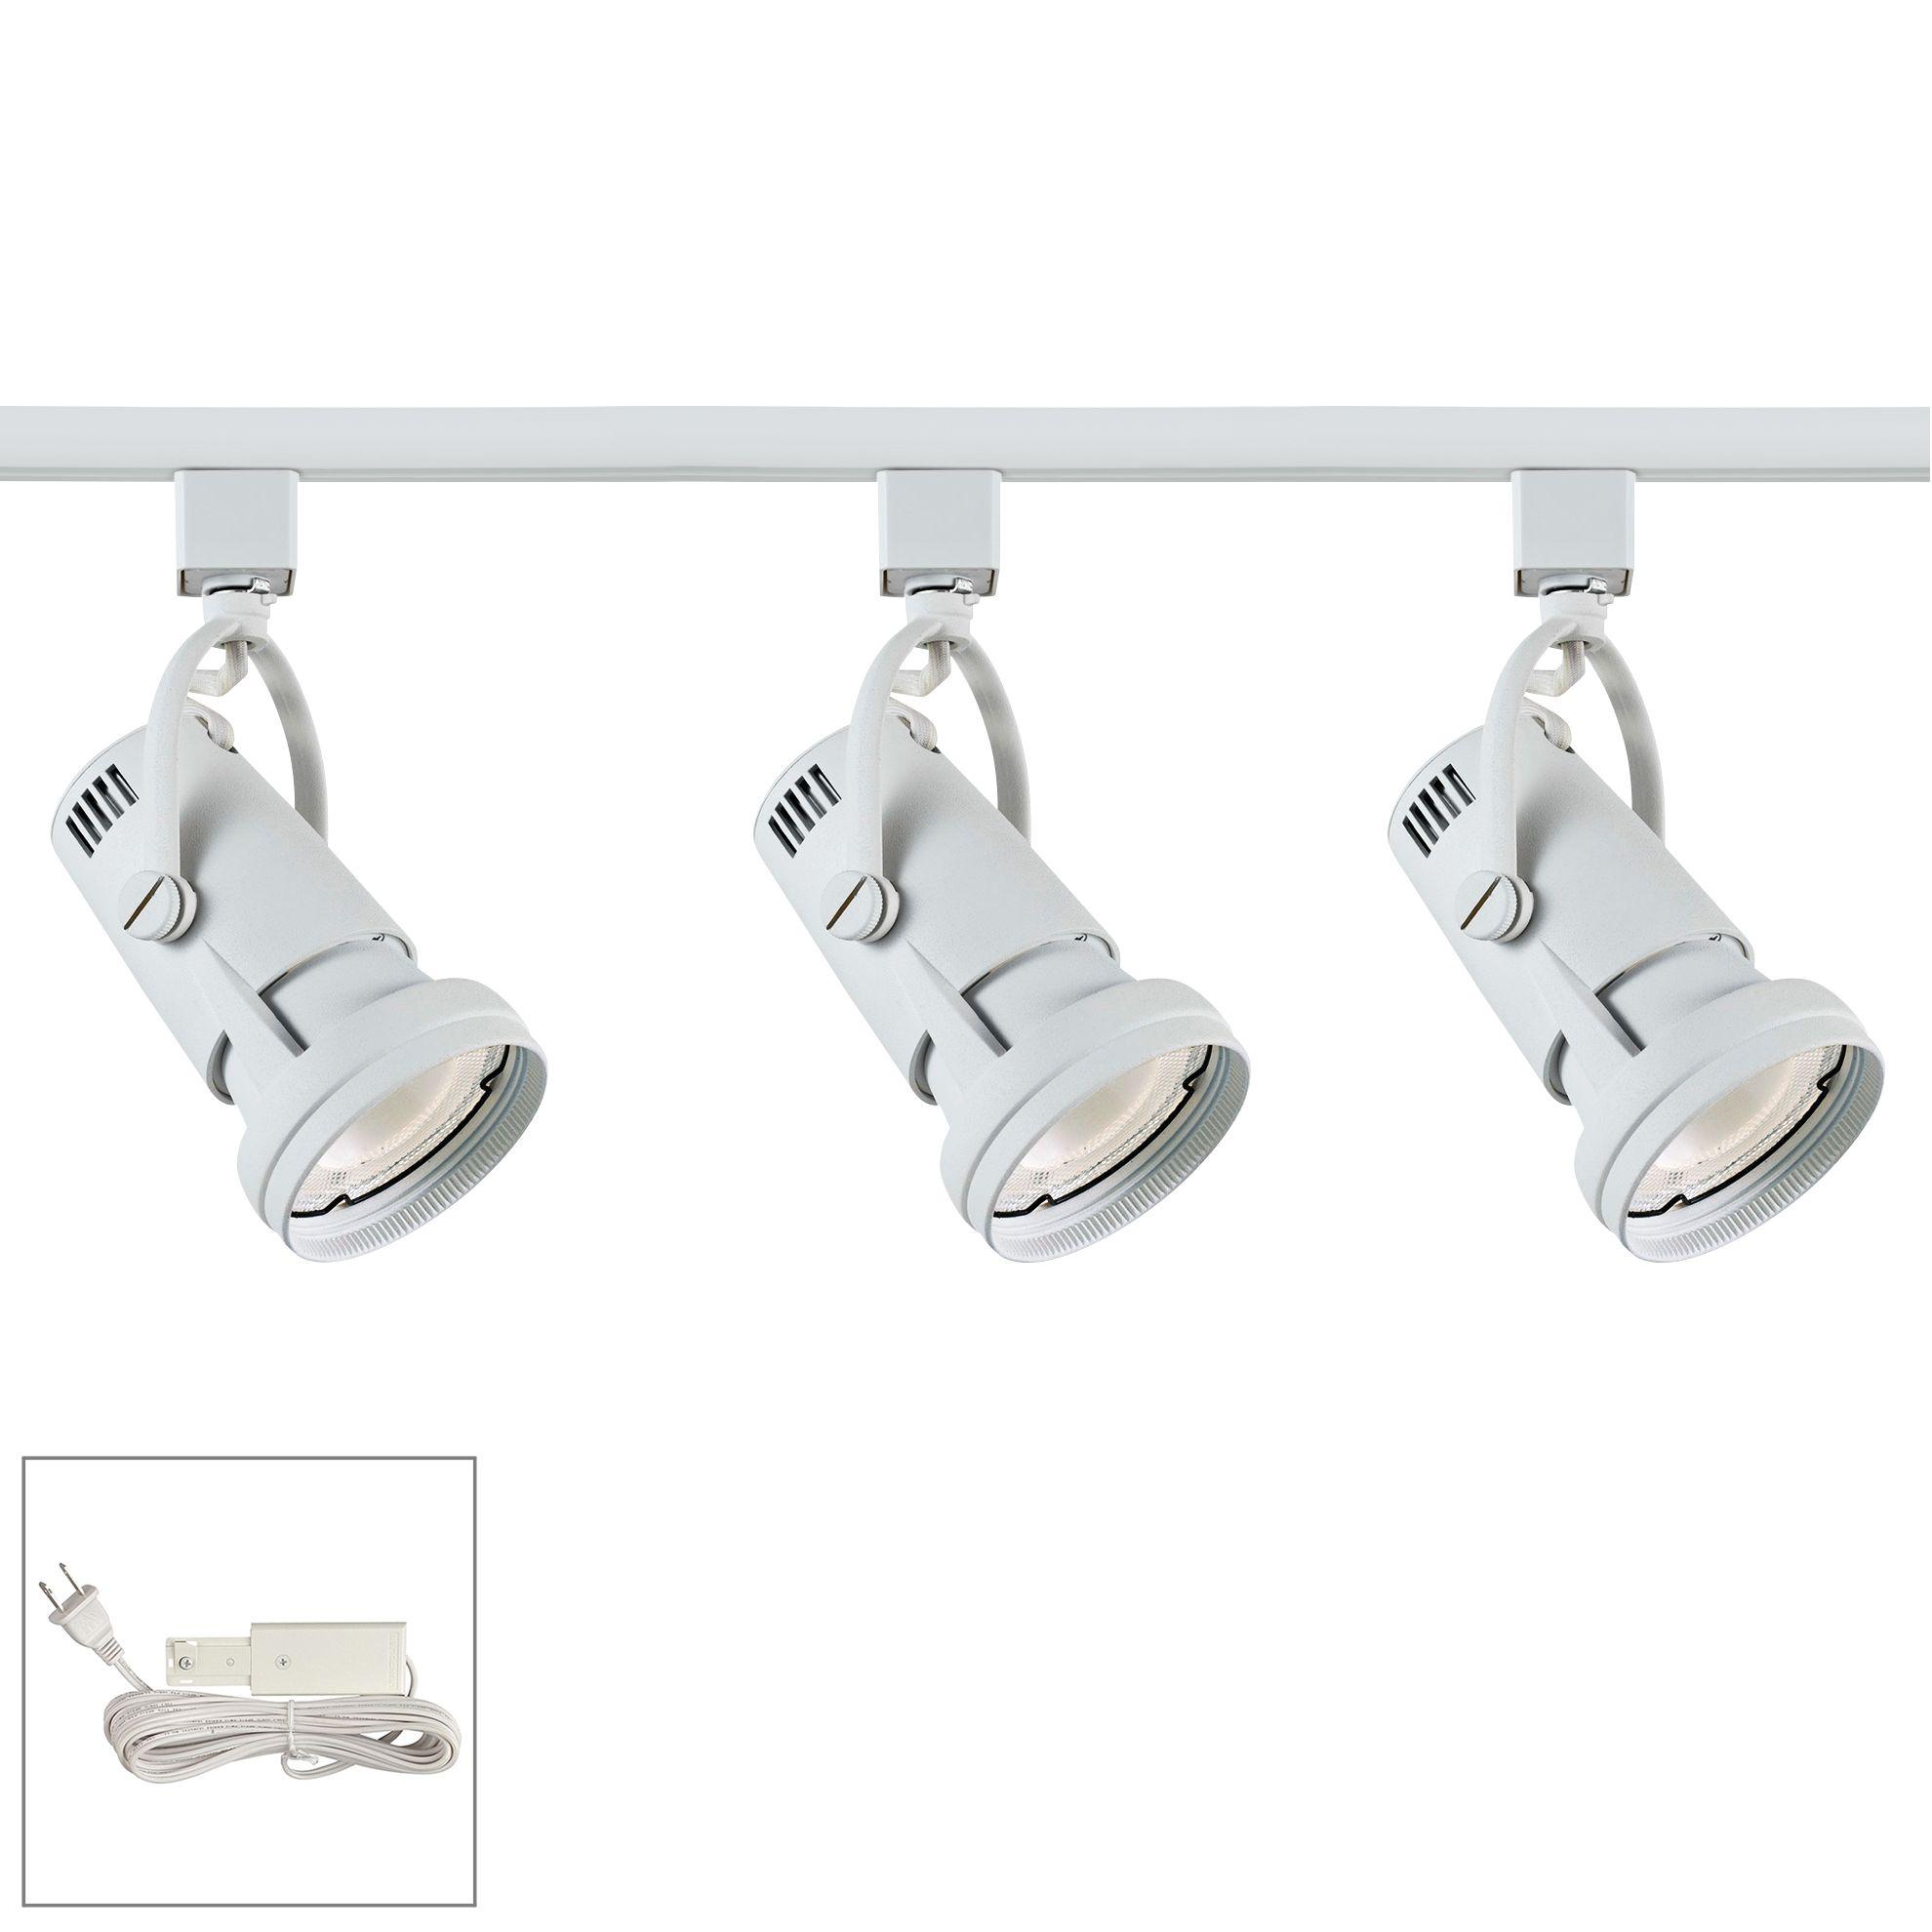 riley 17w 3 light white led plug in linear track kit